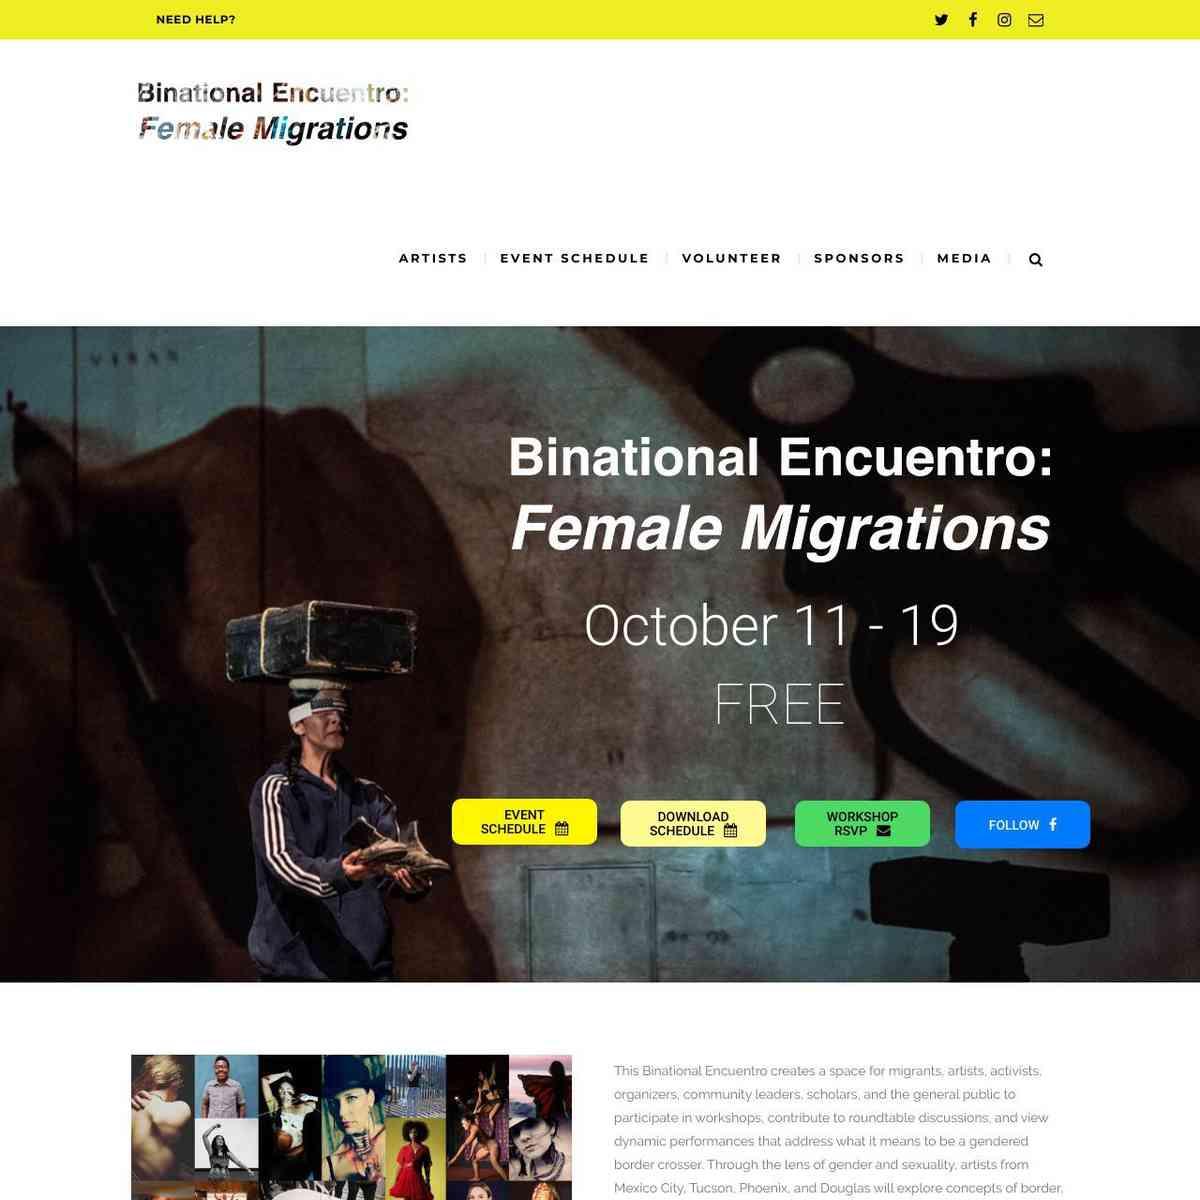 Binational Encuentro Event